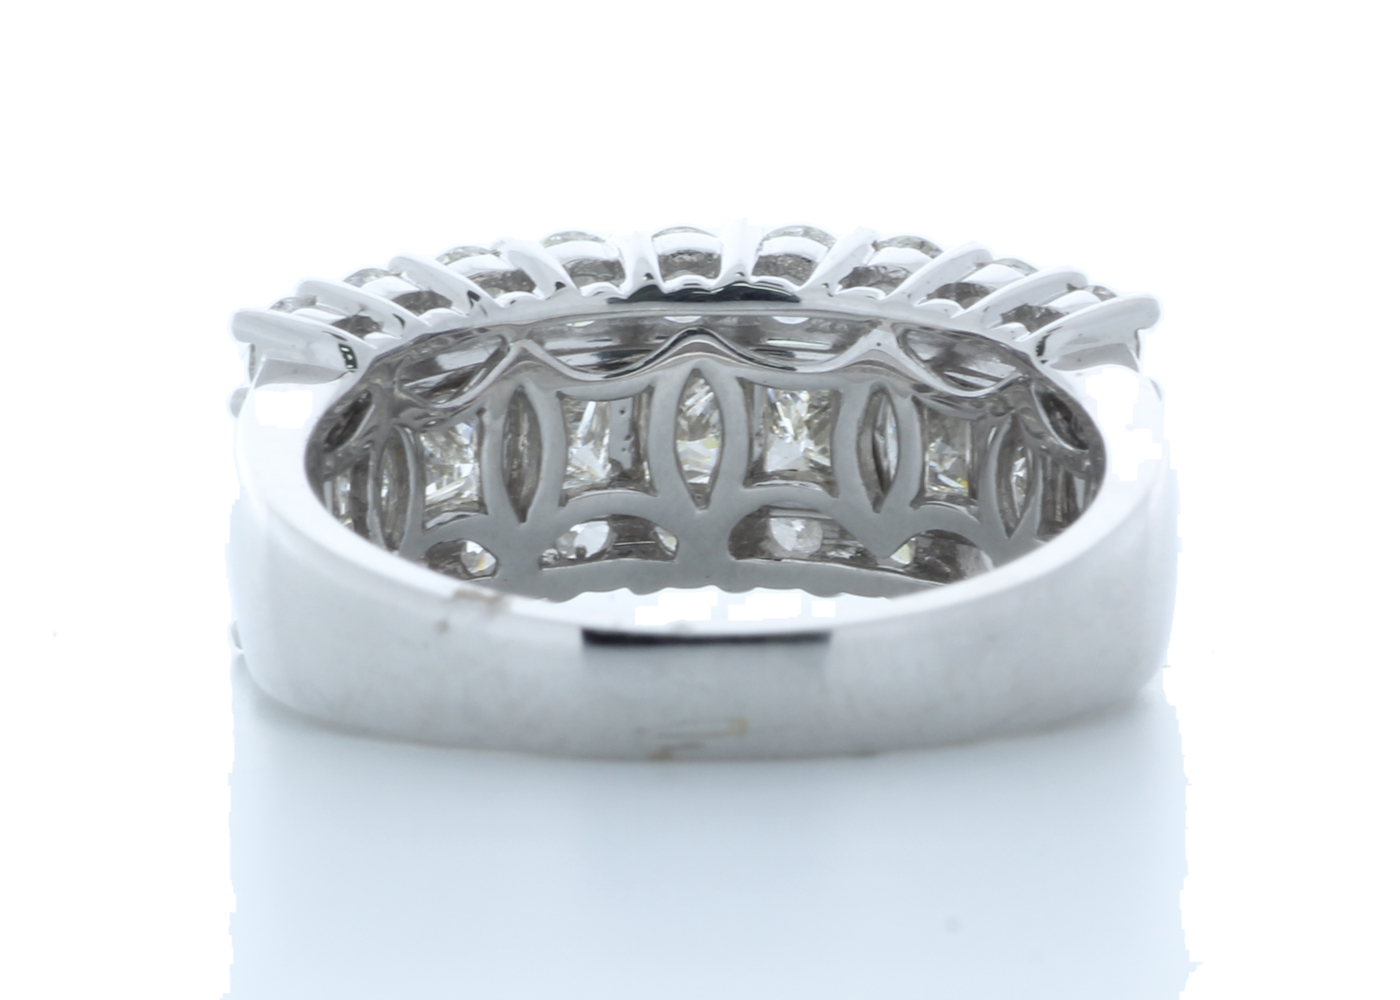 18k White Gold Claw Set Semi Eternity Diamond Ring 2.43 Carats - Image 3 of 4